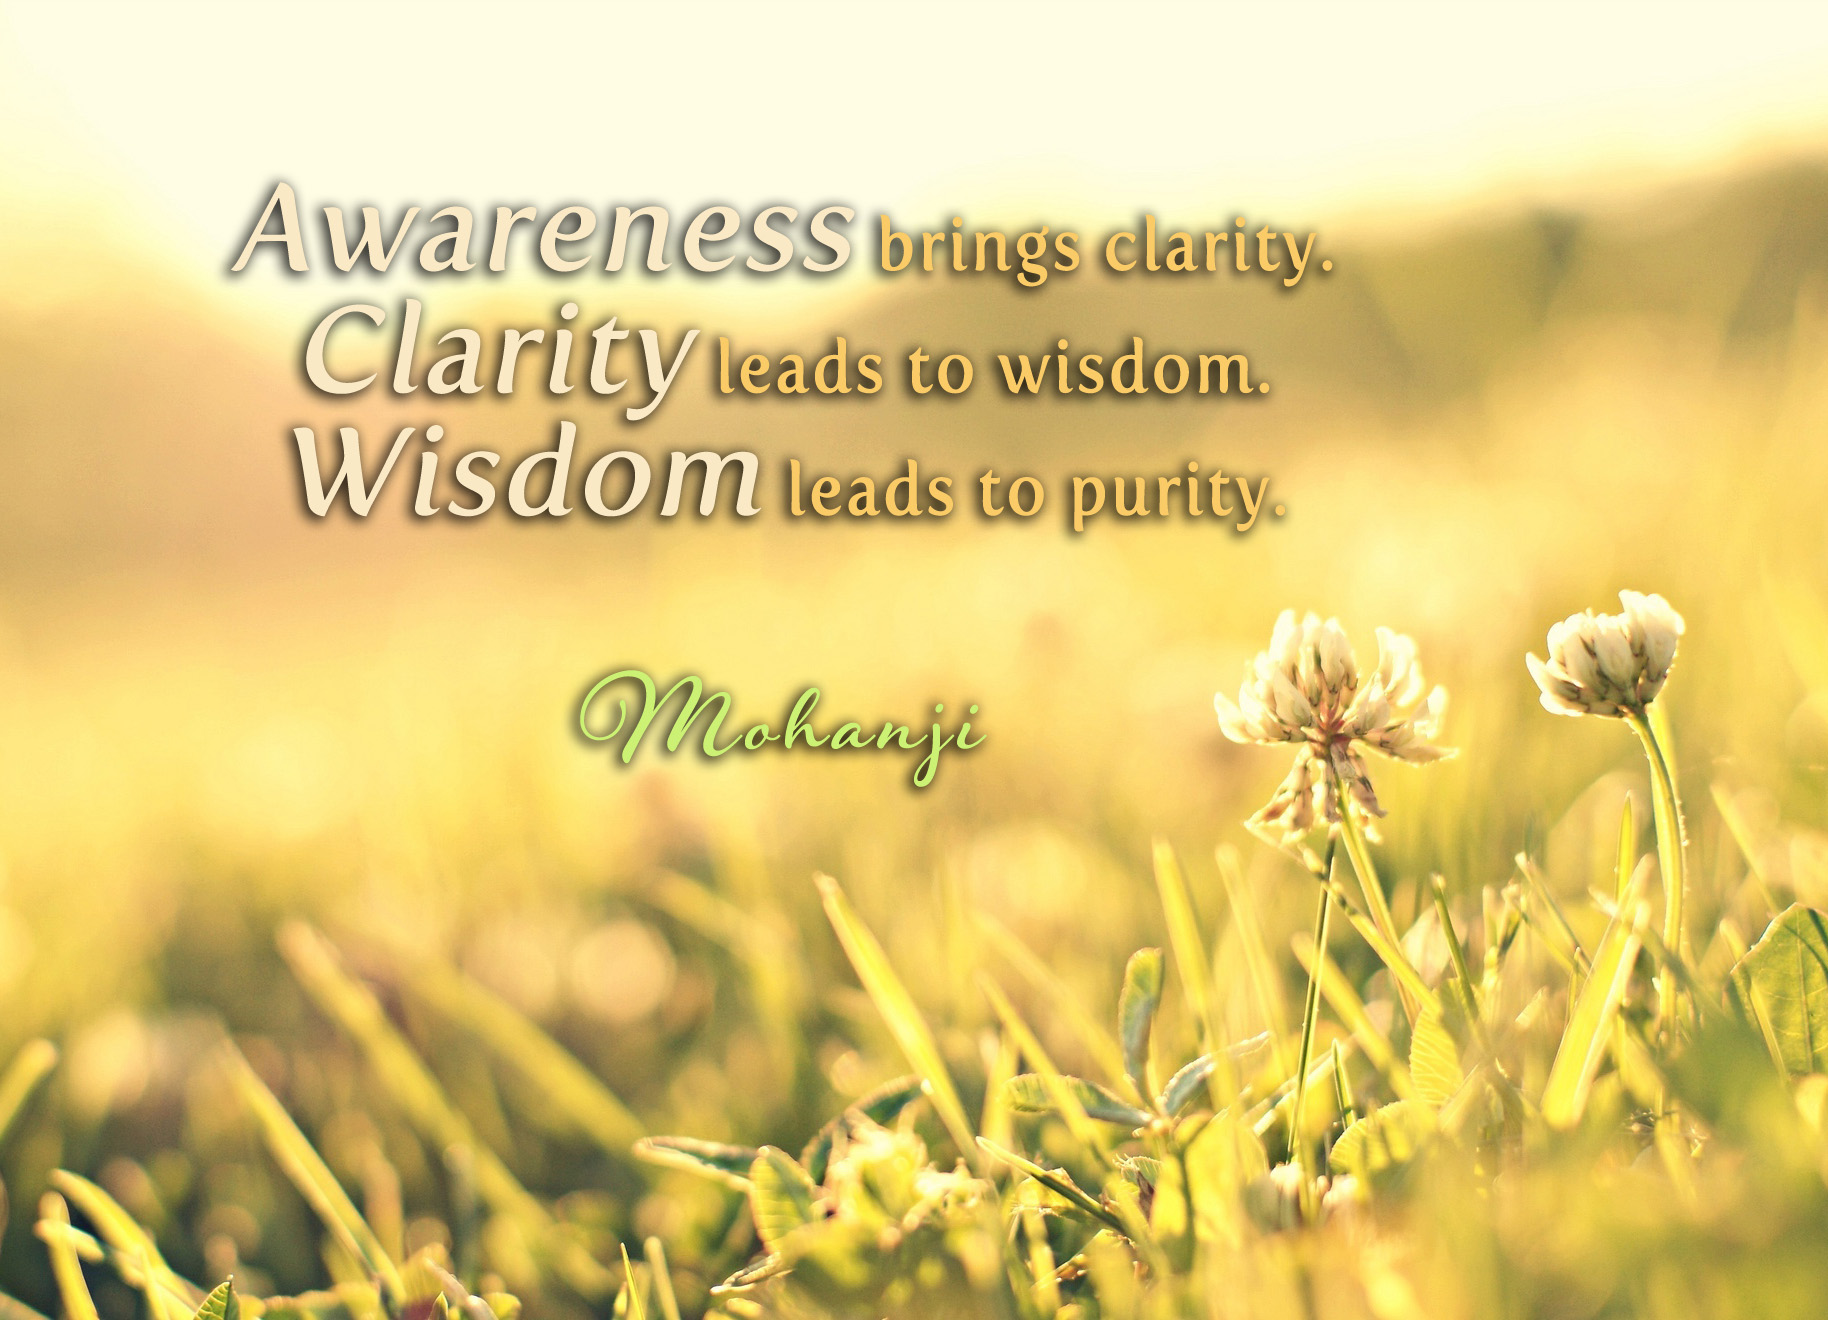 mohanji quotes awareness brings clarity thus spake mohanji